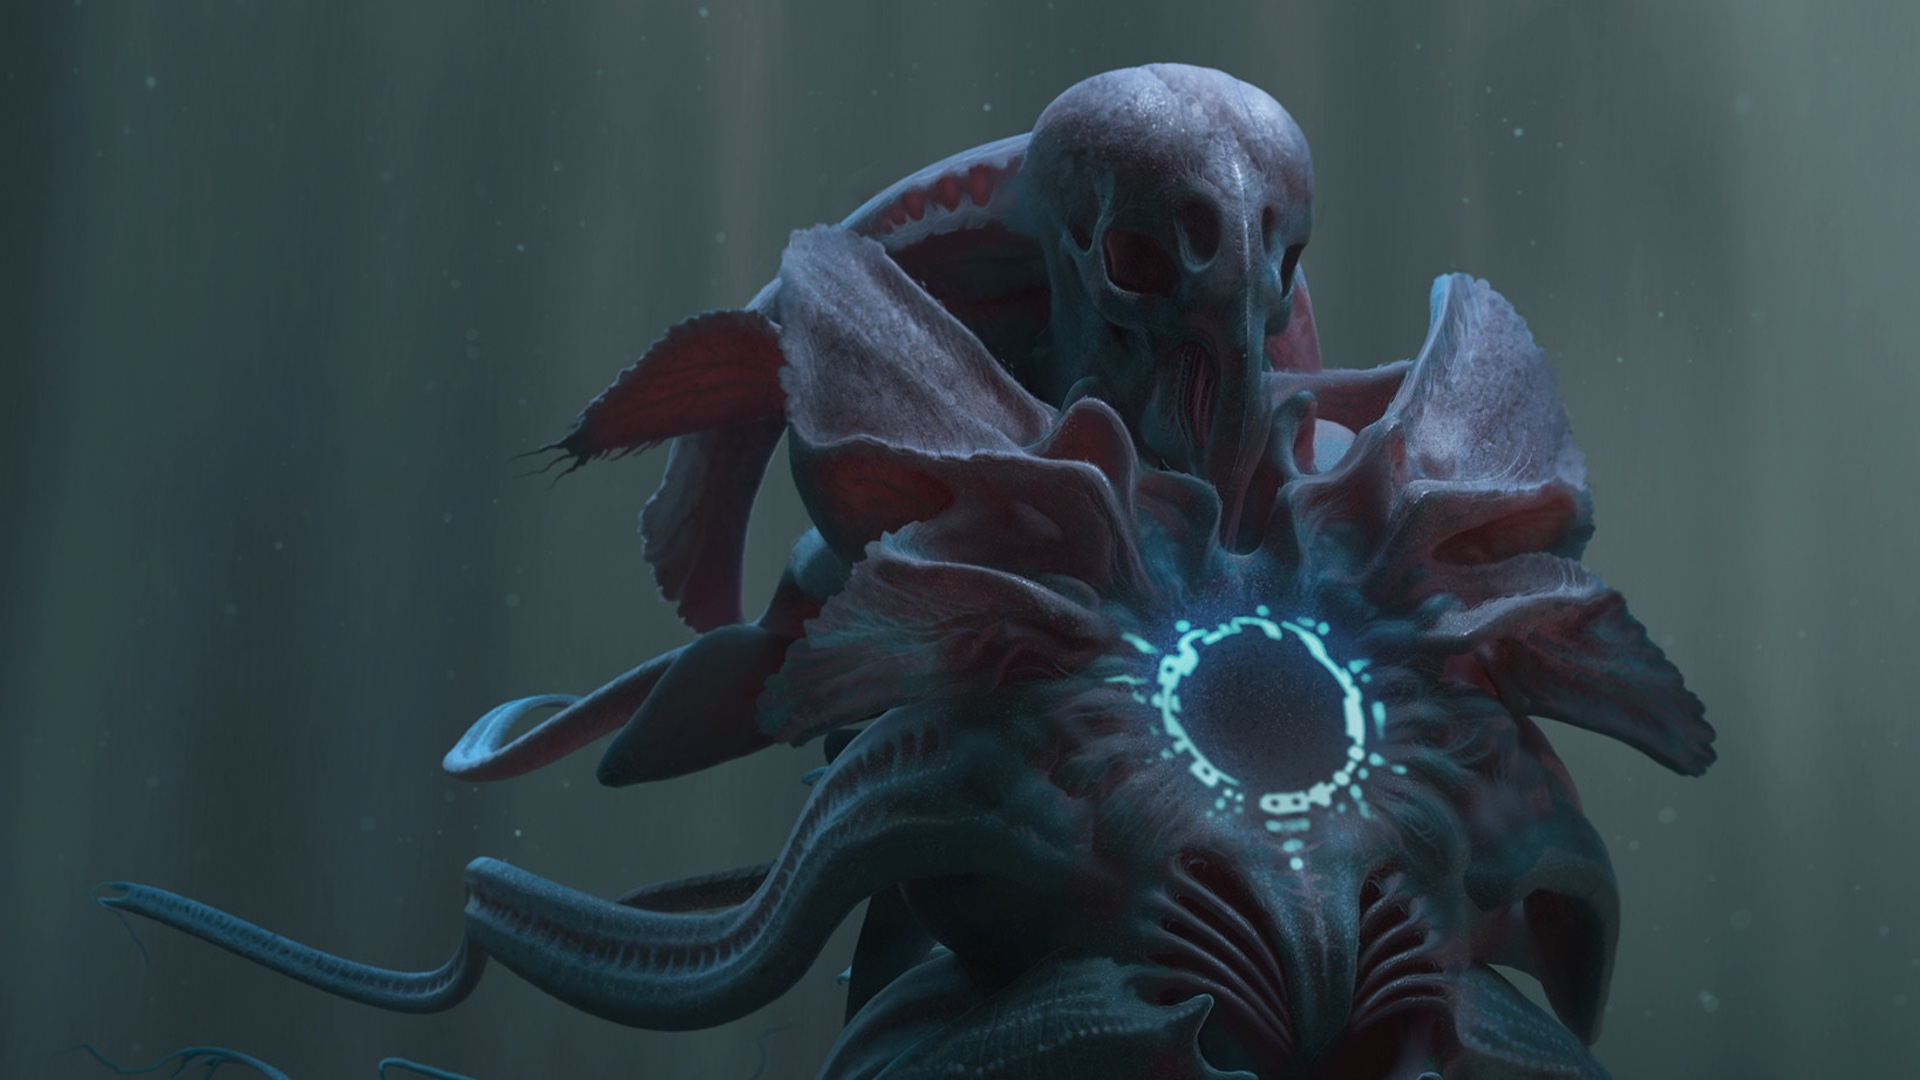 3d Dragon Eye Wallpaper Alternate Alien Concept Designs For The Fantastic Sci Fi